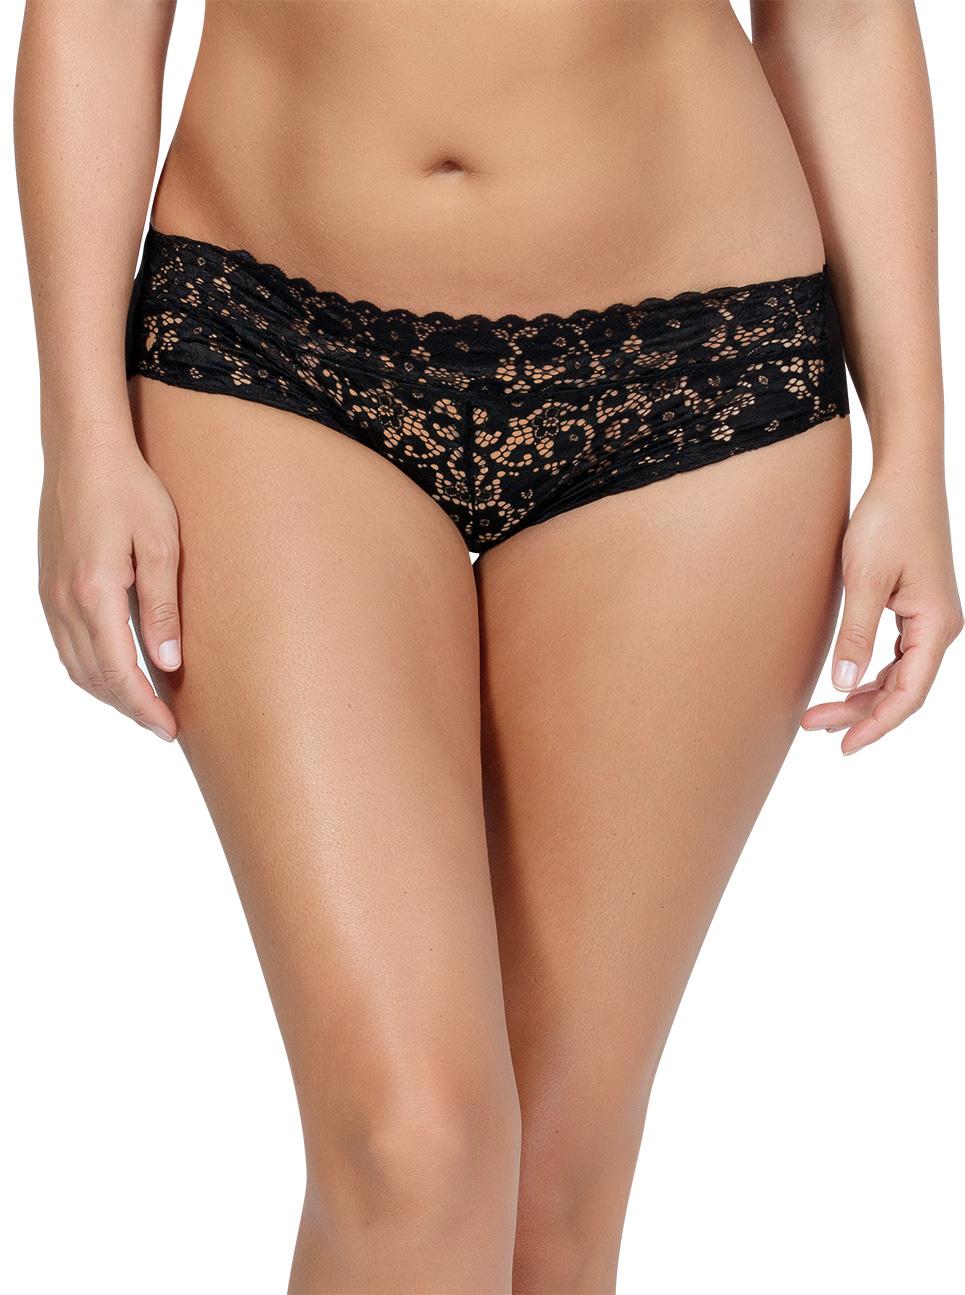 PARFAIT Adriana BikiniP5483 Black Front - Adriana Bikini - Black - P5483